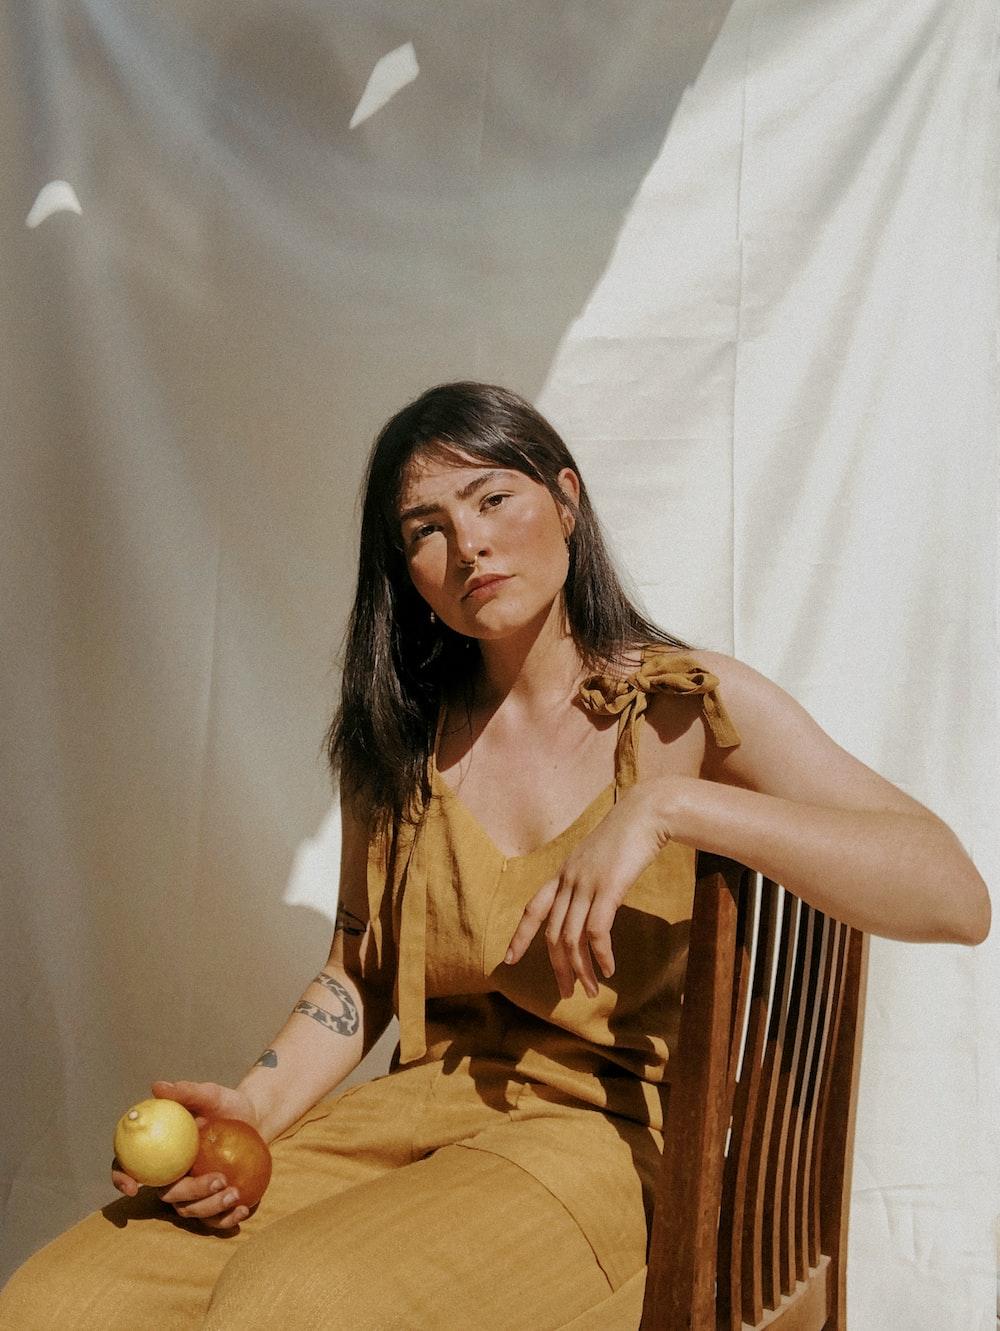 woman in orange sleeveless dress sitting on brown wooden chair